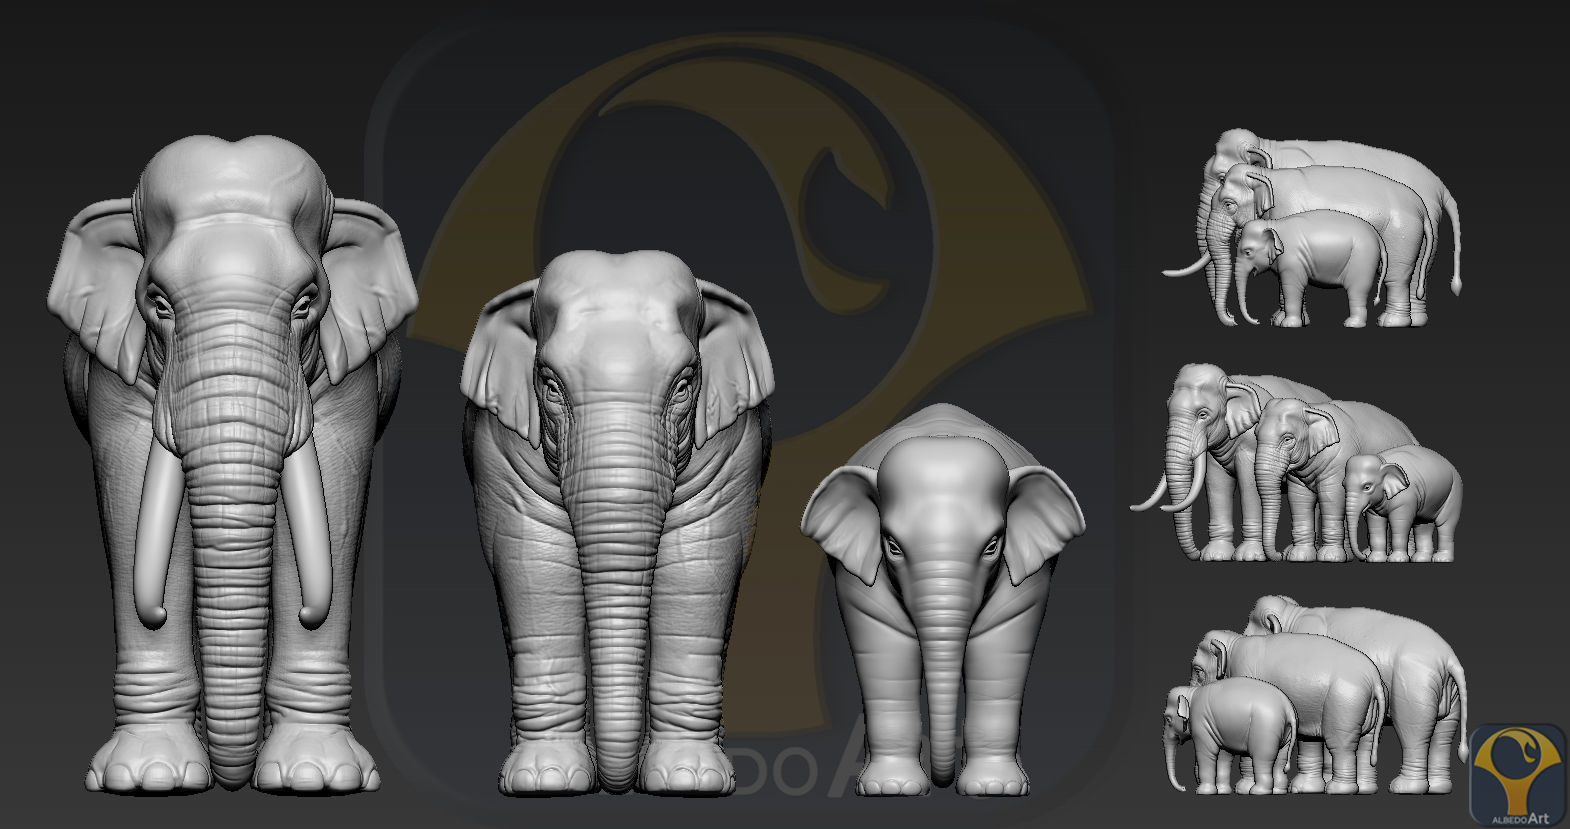 Elephant asian